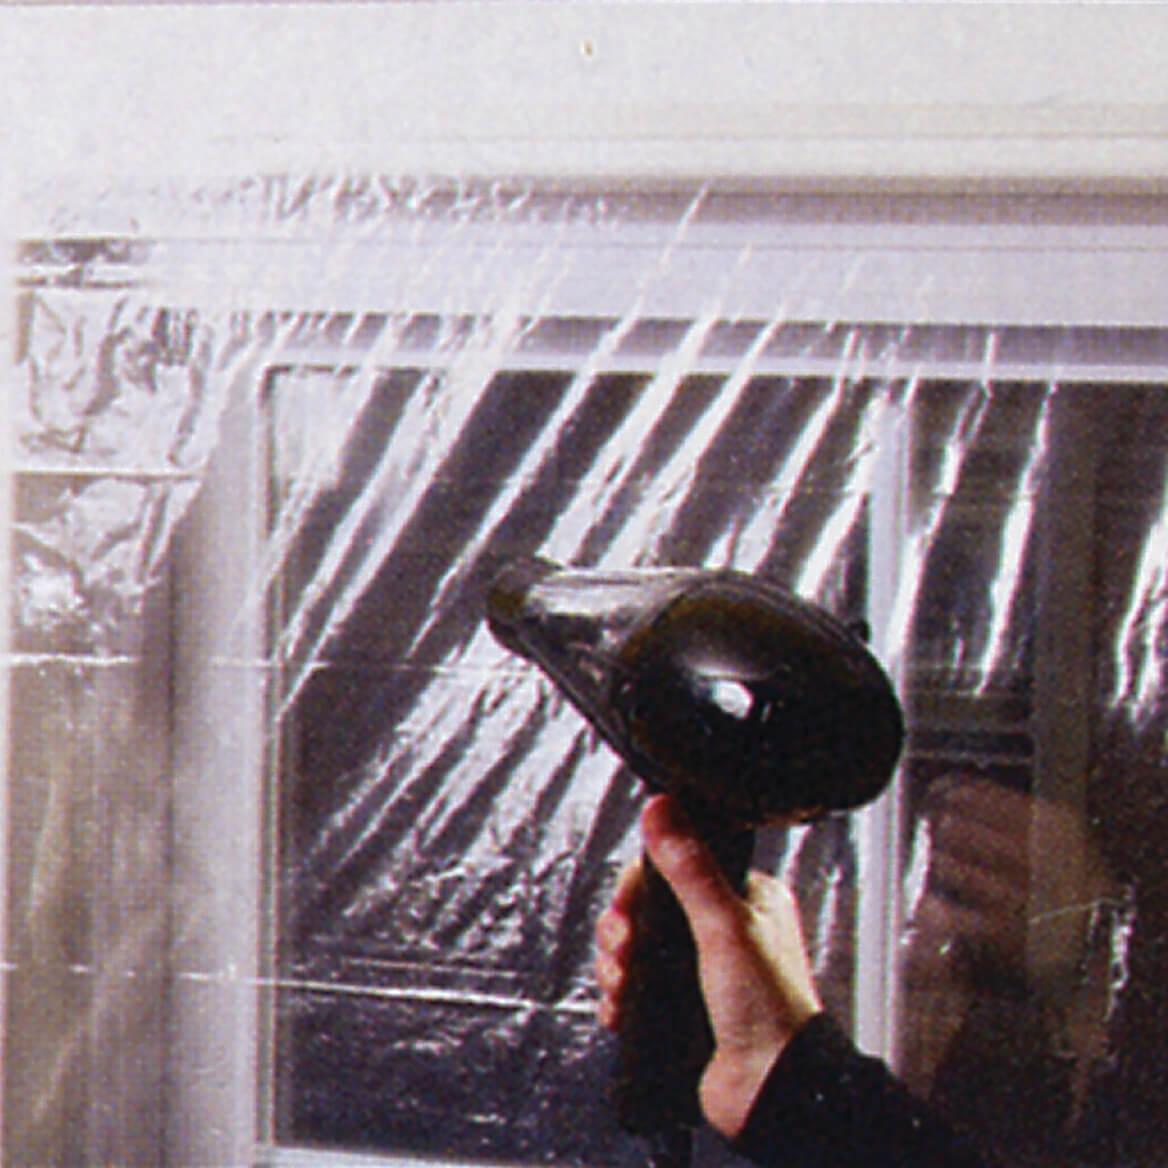 Window Insulation Shrink Kit, Standard, 3-Pack-370470